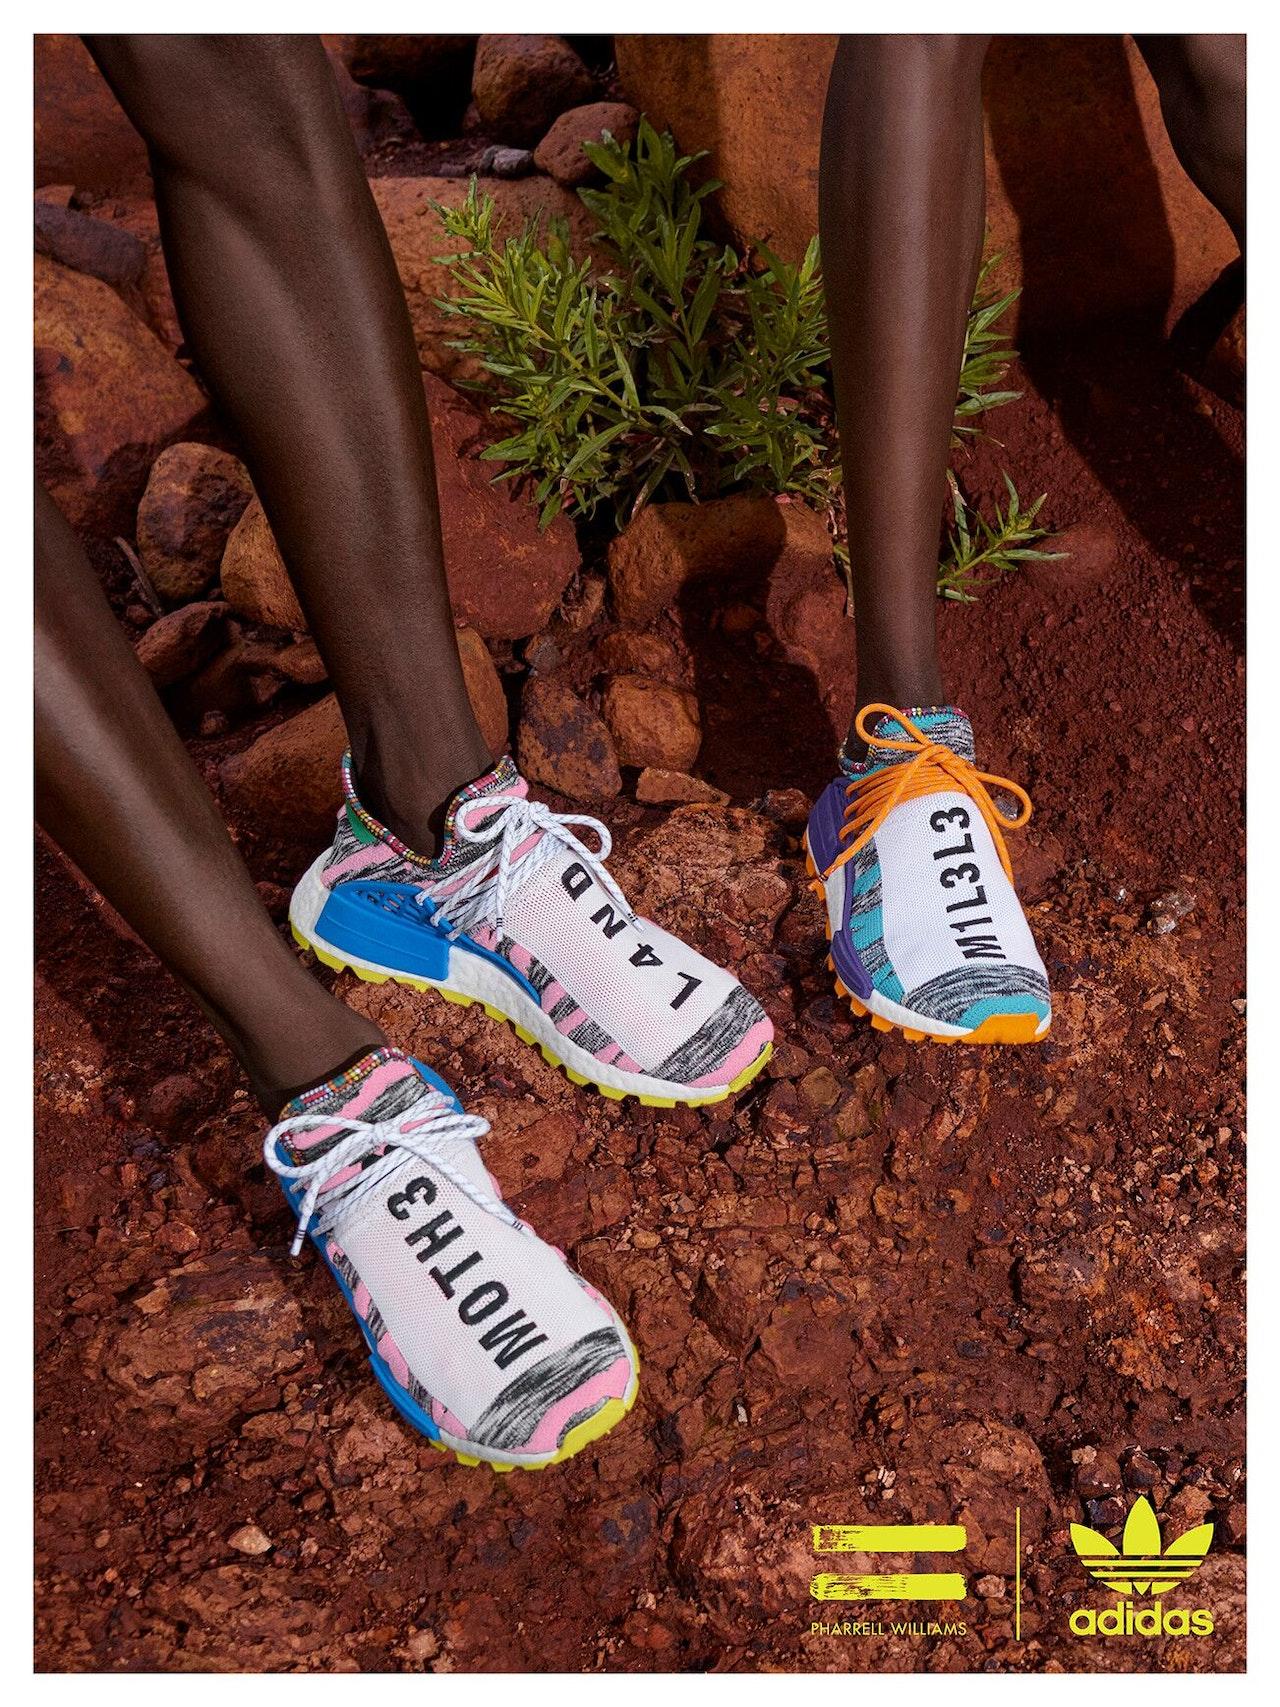 cfb424f74 The All-New Pharrell Williams x Adidas  Solar Hu  Collection Draws ...